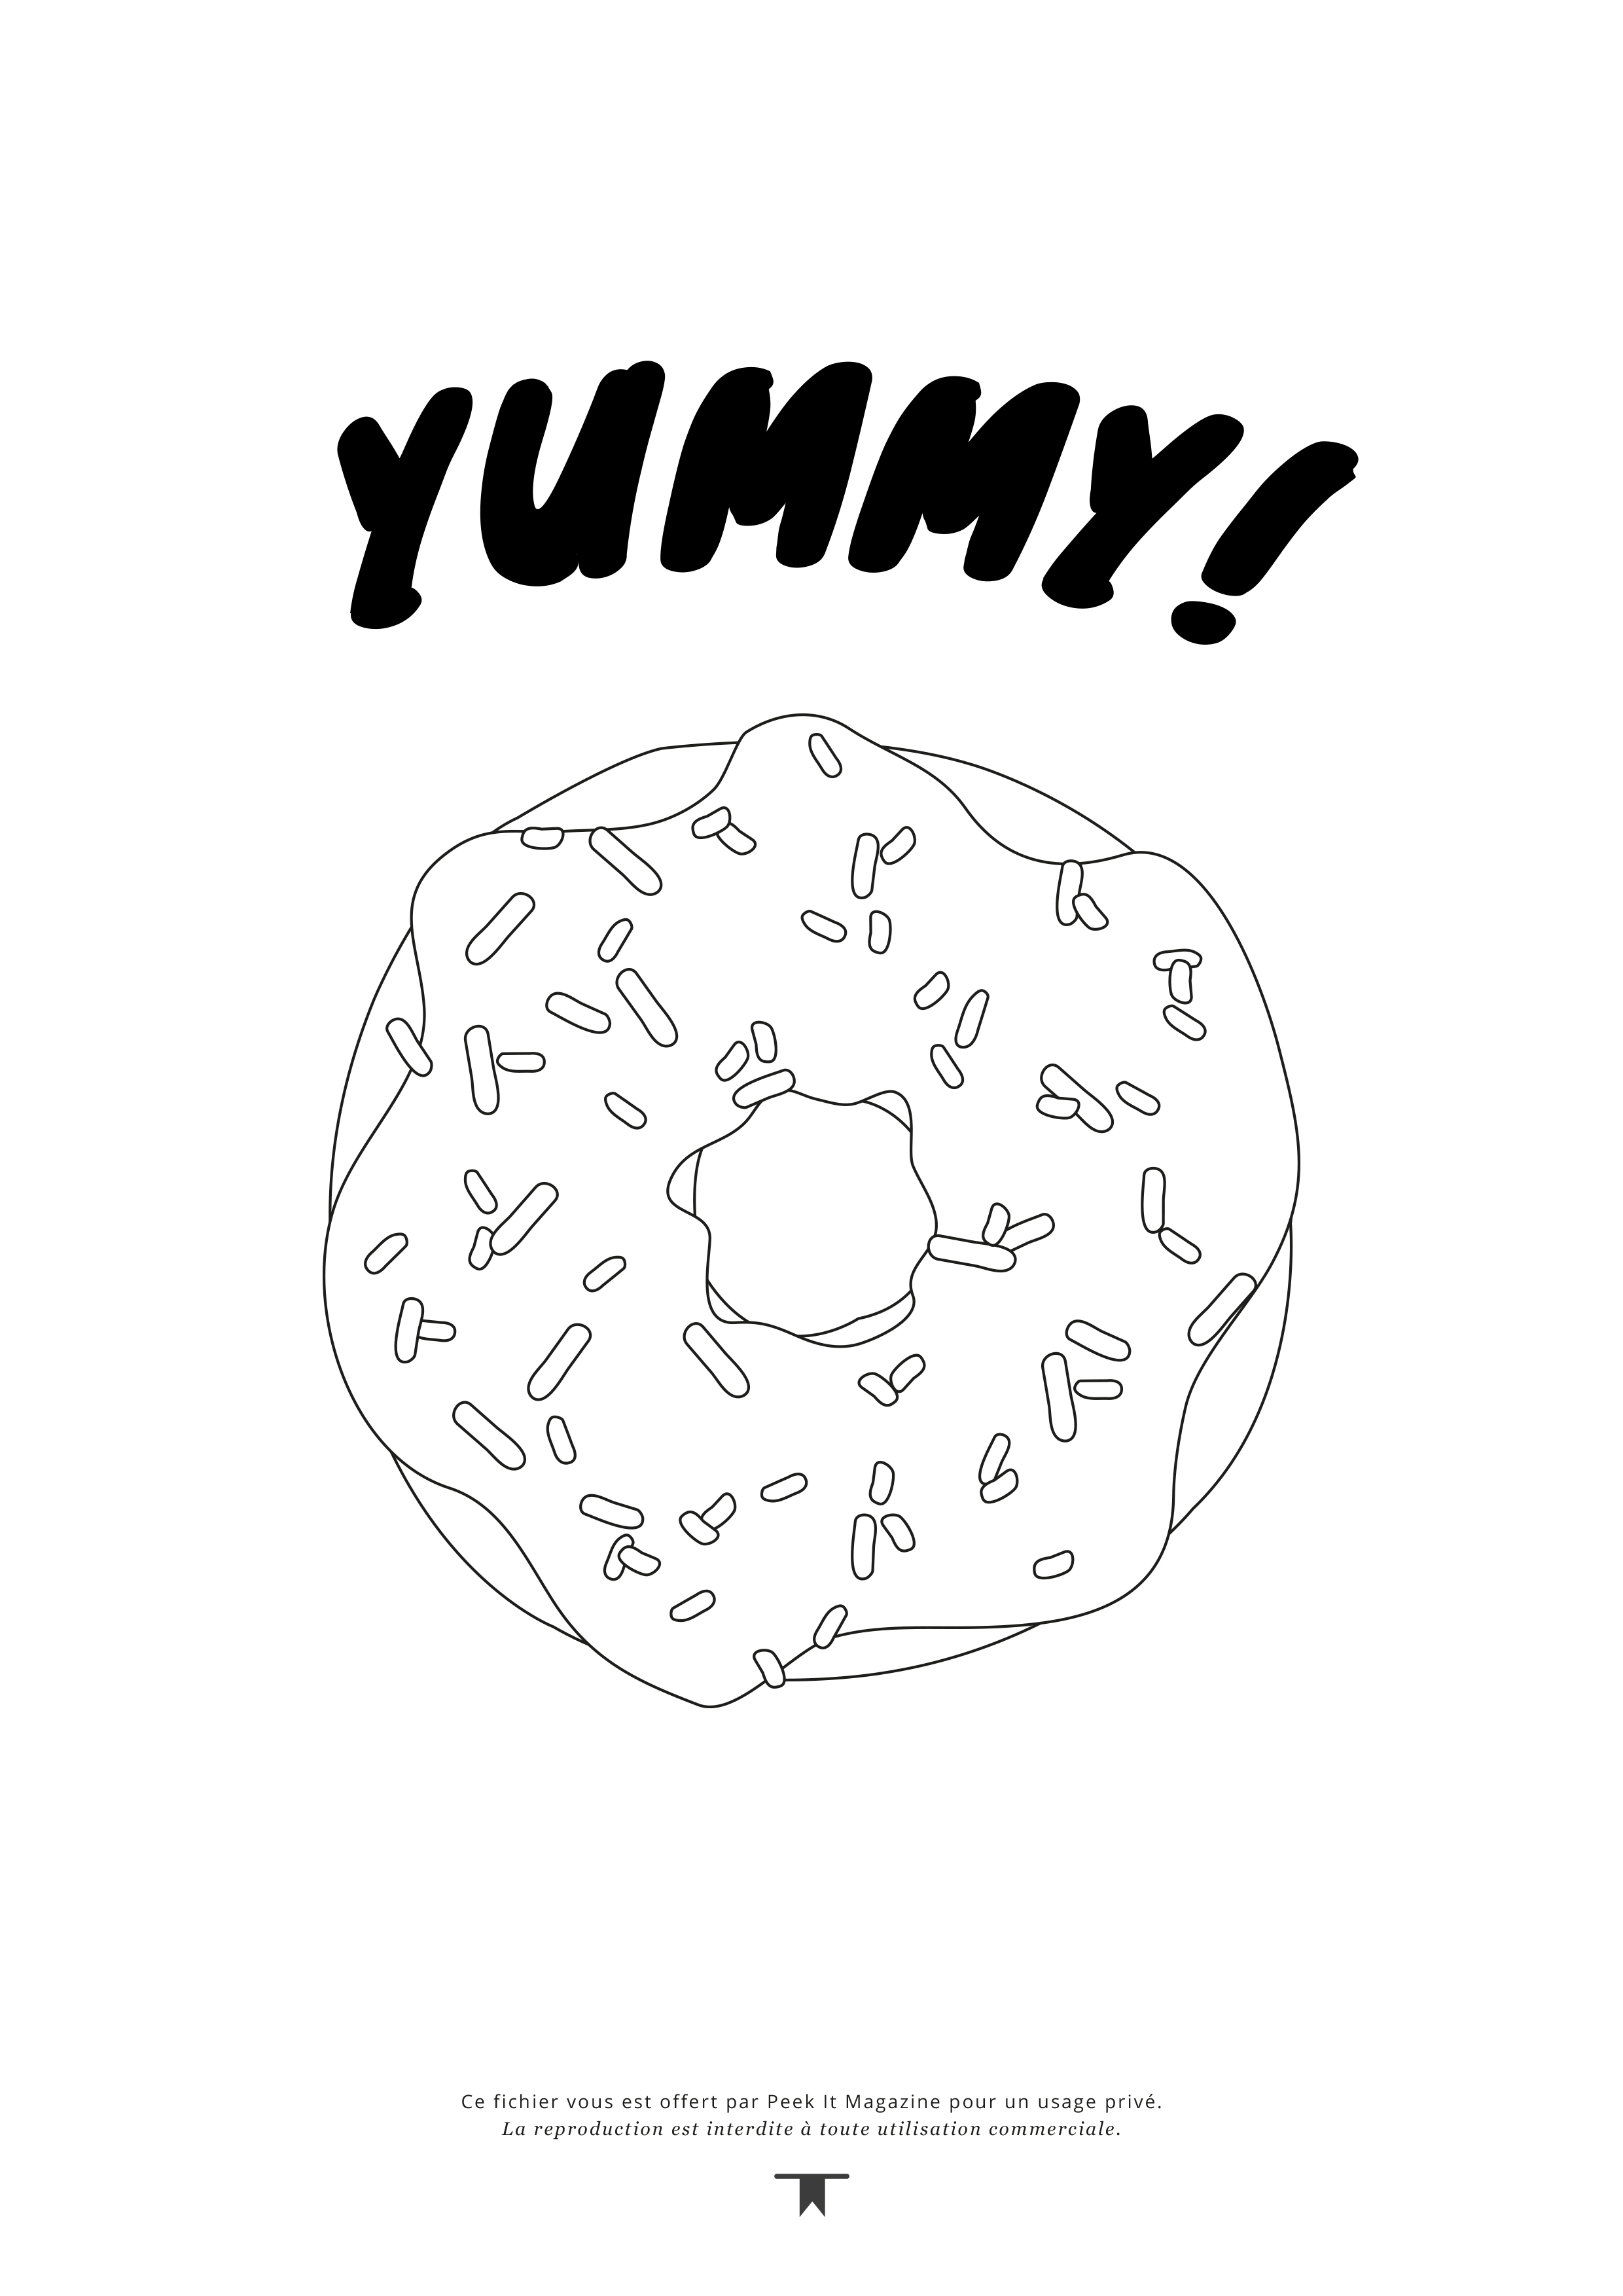 Coloriage Donuts Peekitmagazine